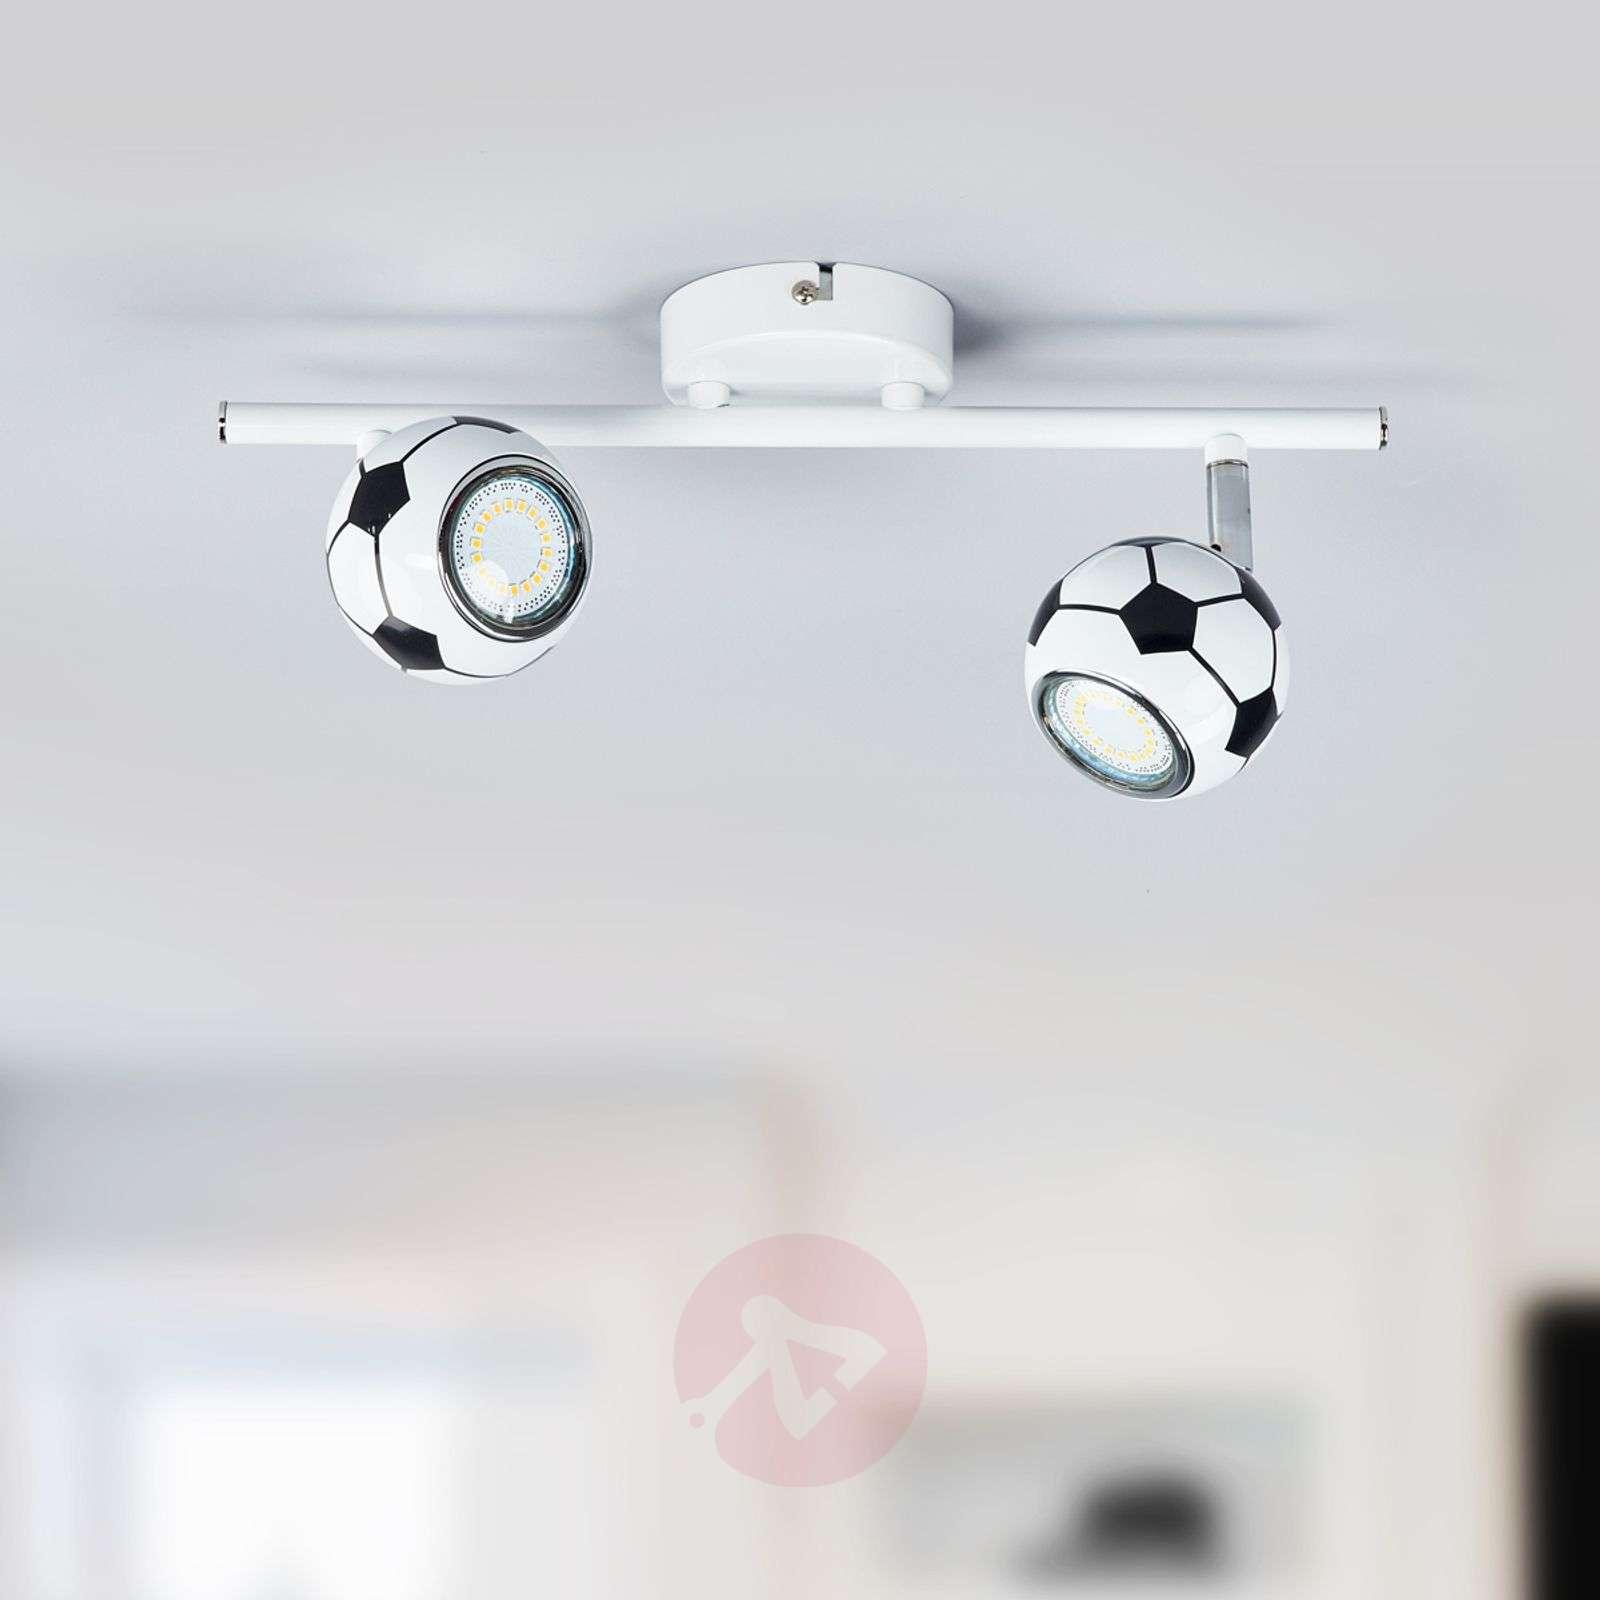 Stylish Led Ceiling Light Play Football Look Lights Ie